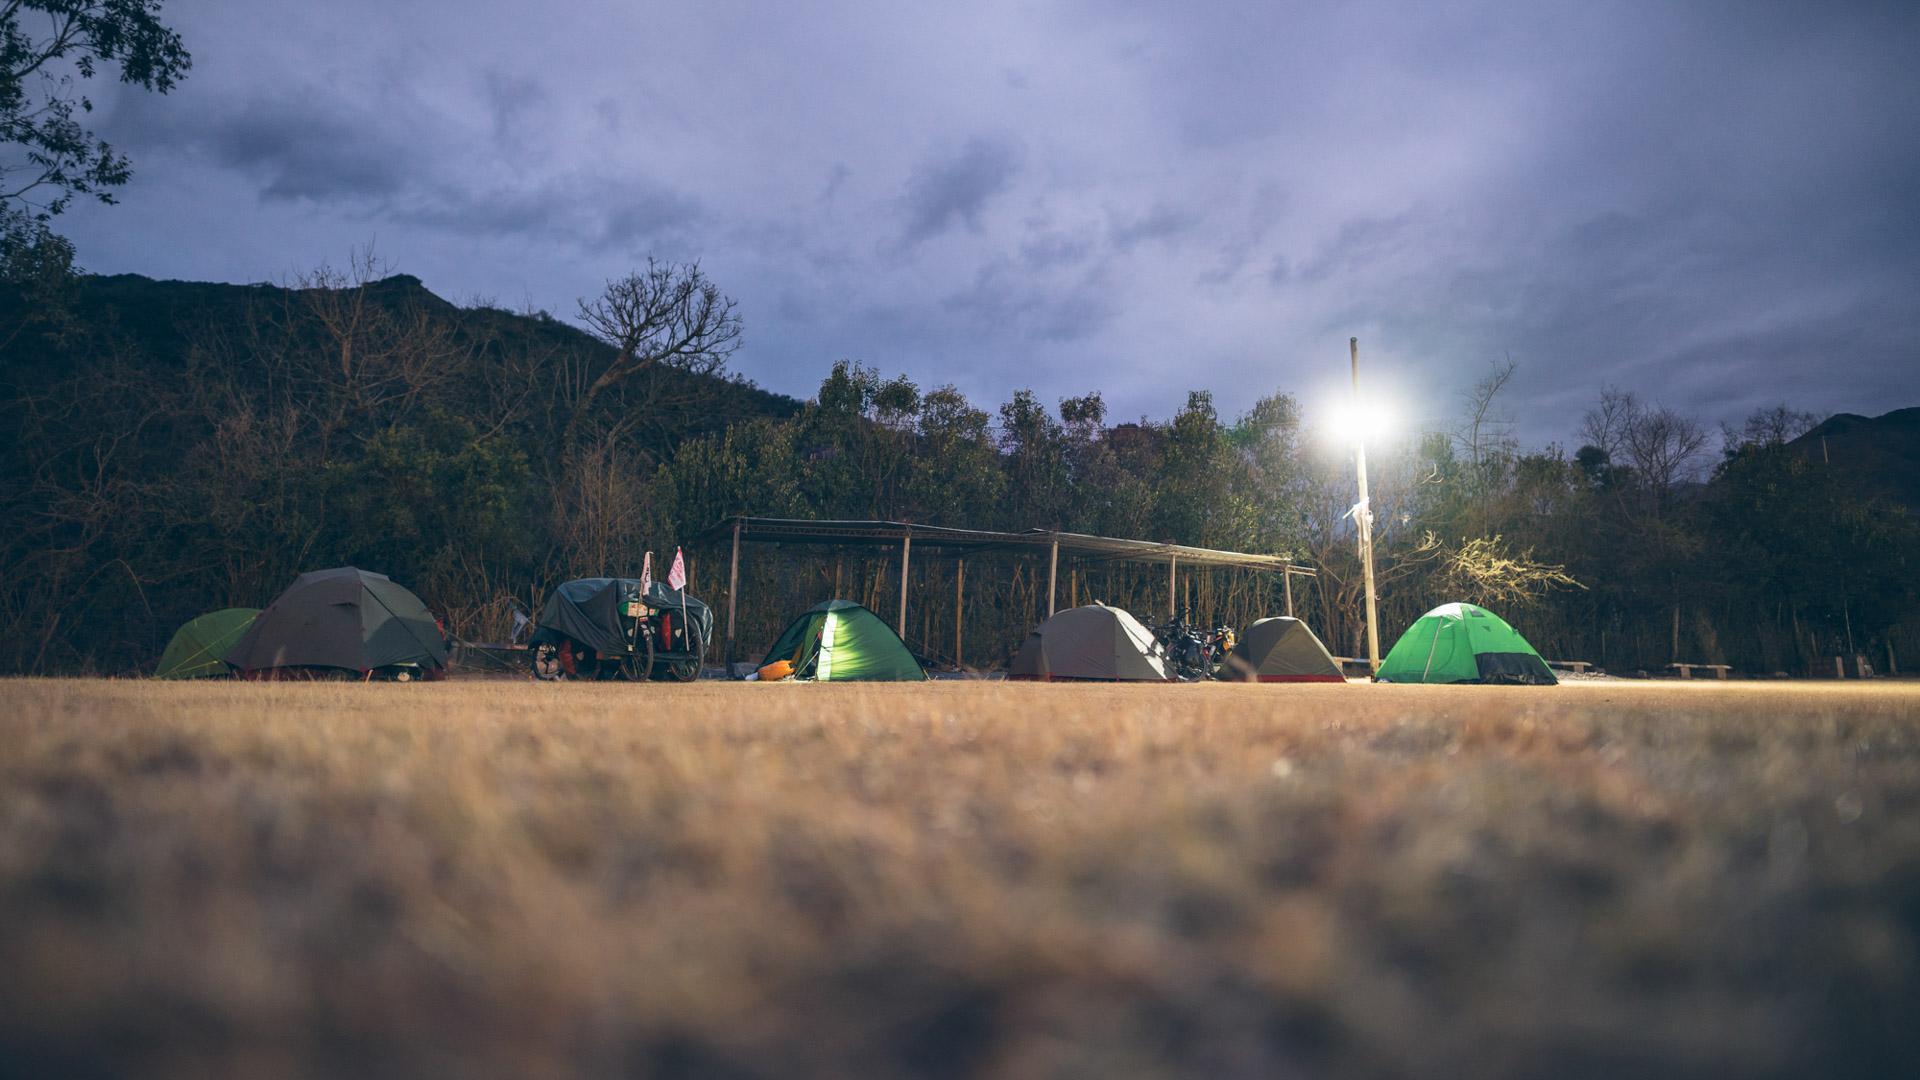 Bivouac dans un stade de foot